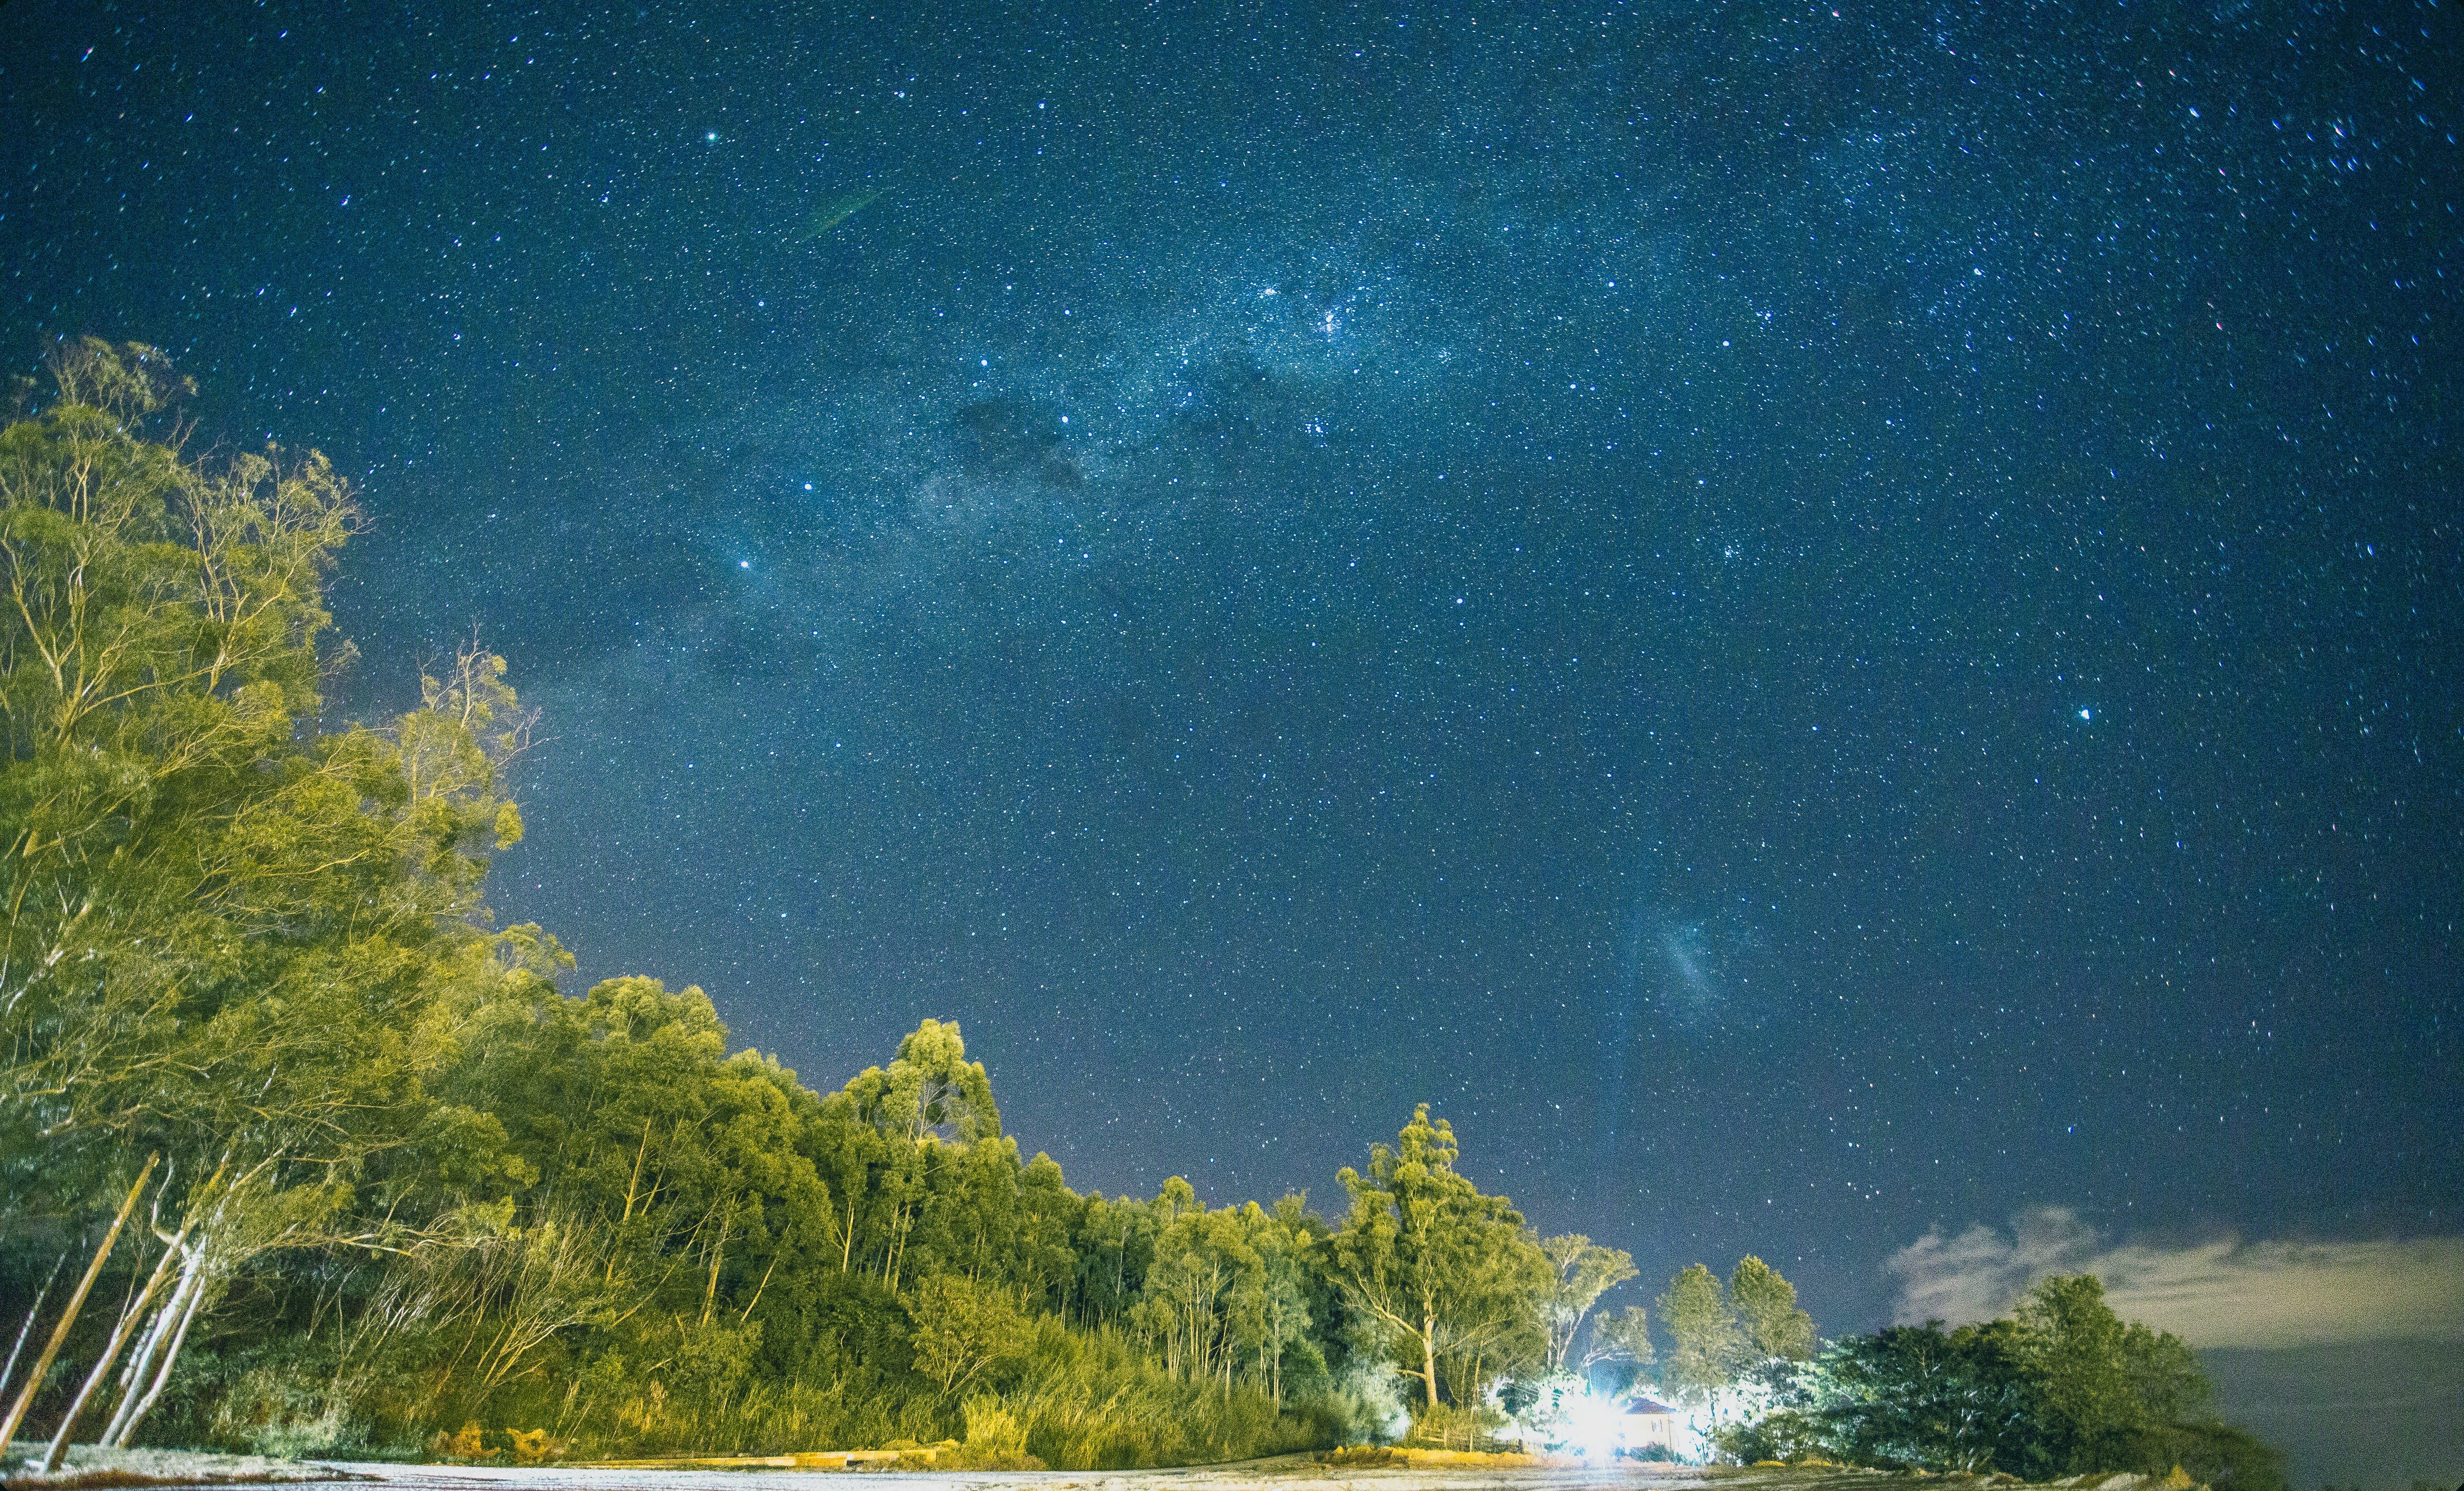 Low-angle Photography of Trees Under Nebula Stars